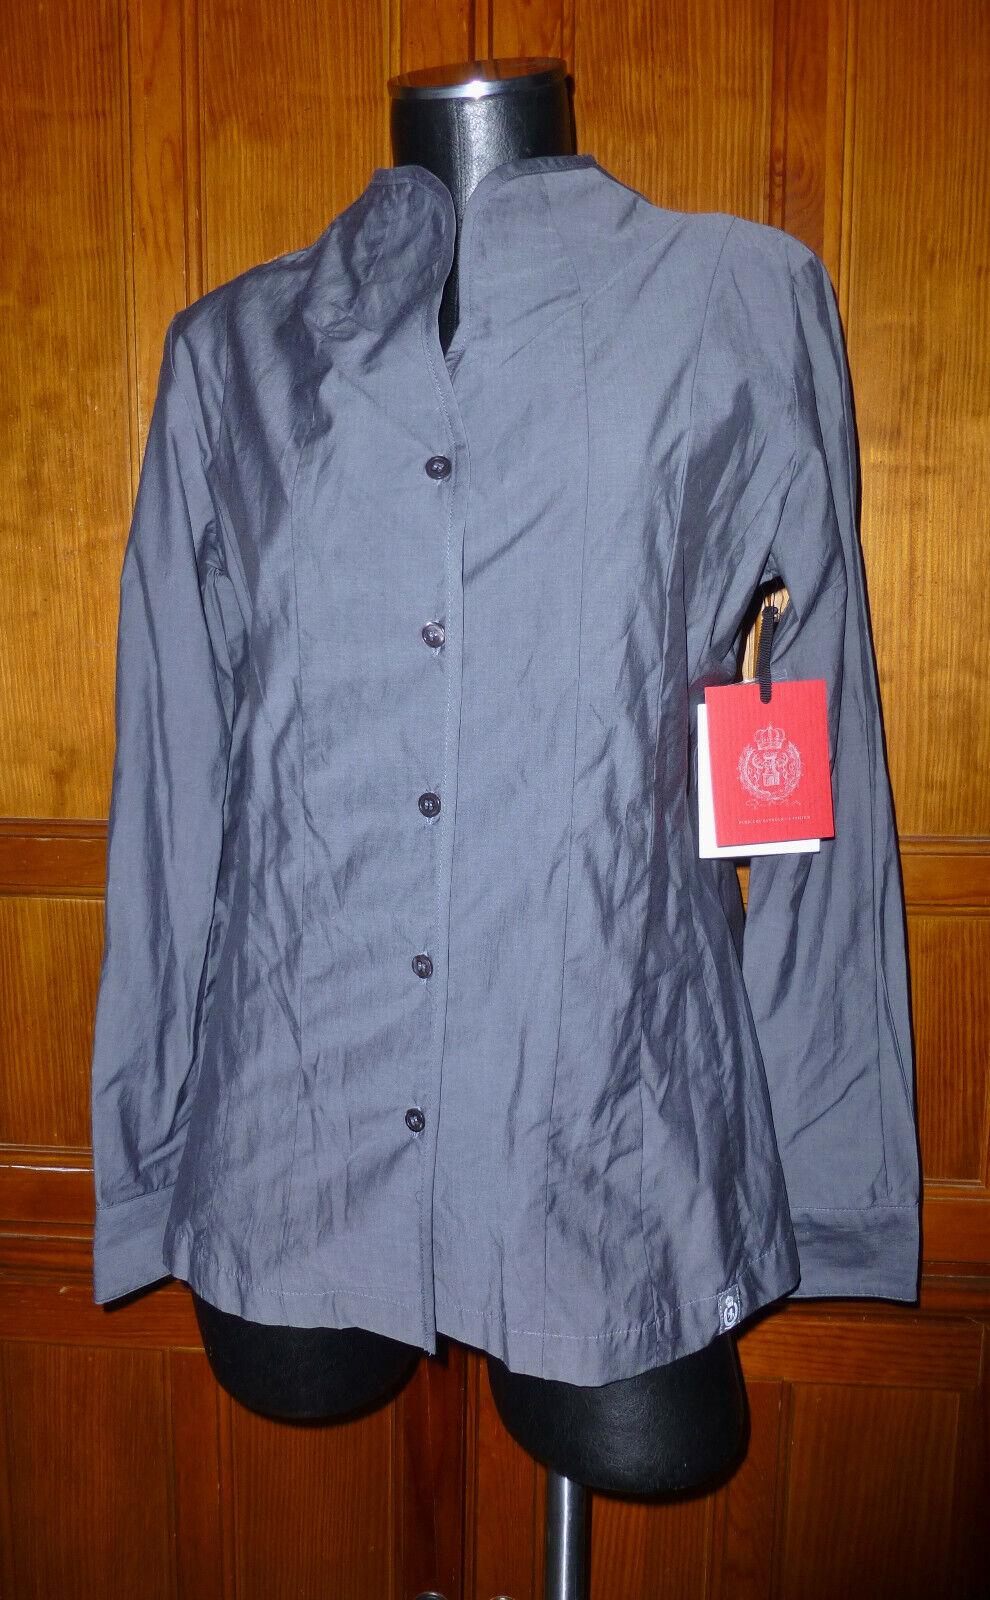 New O'shaughnessy Sara Griot Fine Equestrian Cotton Blouse Top Shirt Größe 6